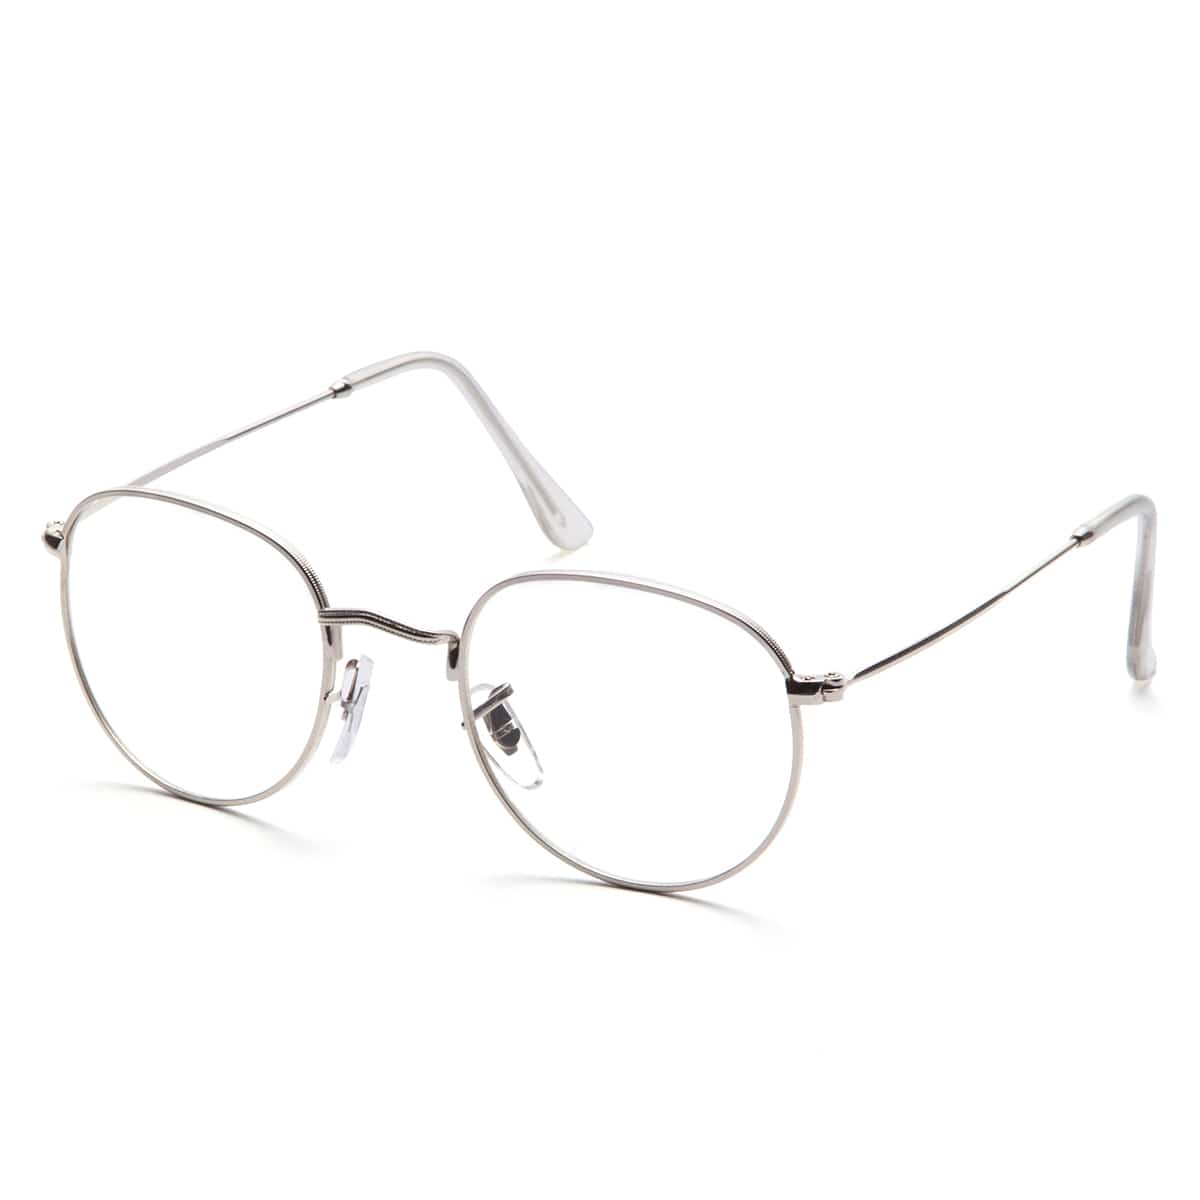 SHEIN / Rahmen klare Linse Gläser-silber